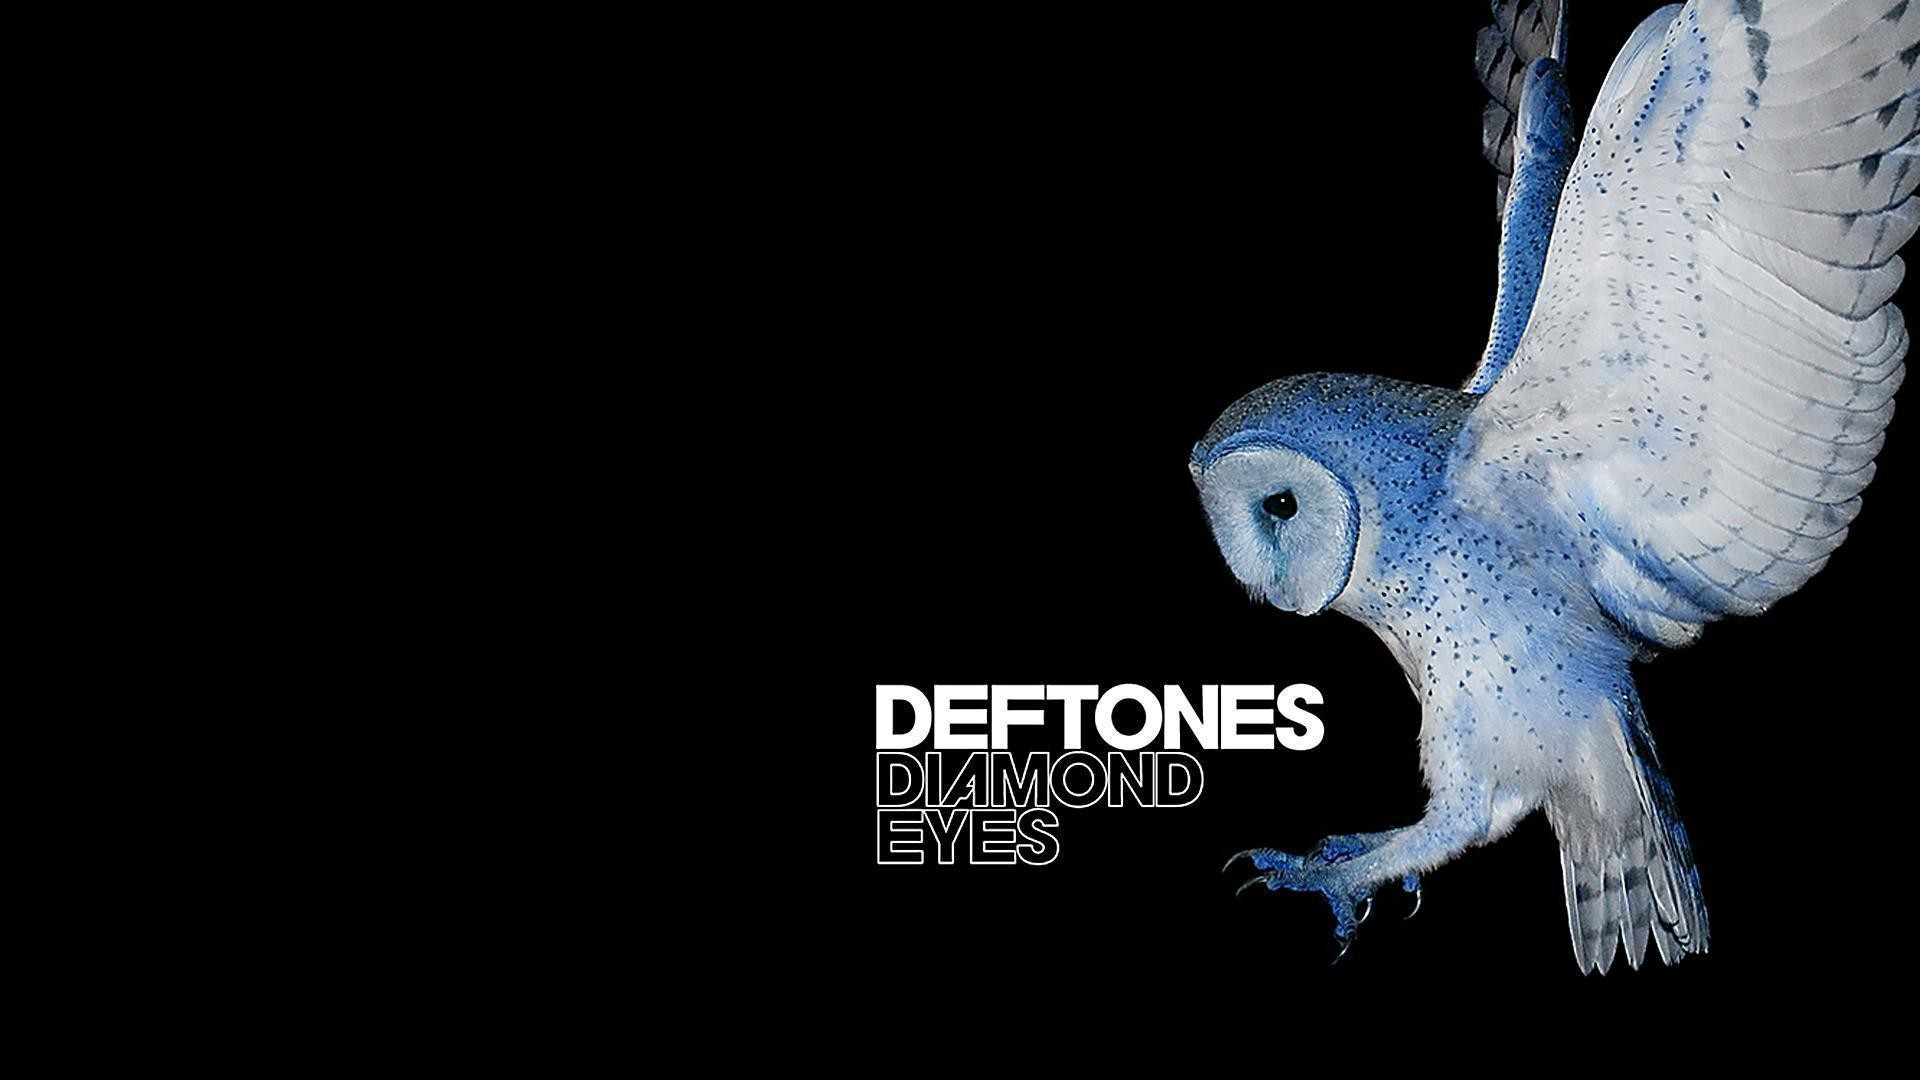 Deftones – Diamond Eyes iPhone 5 / SE Wallpaper